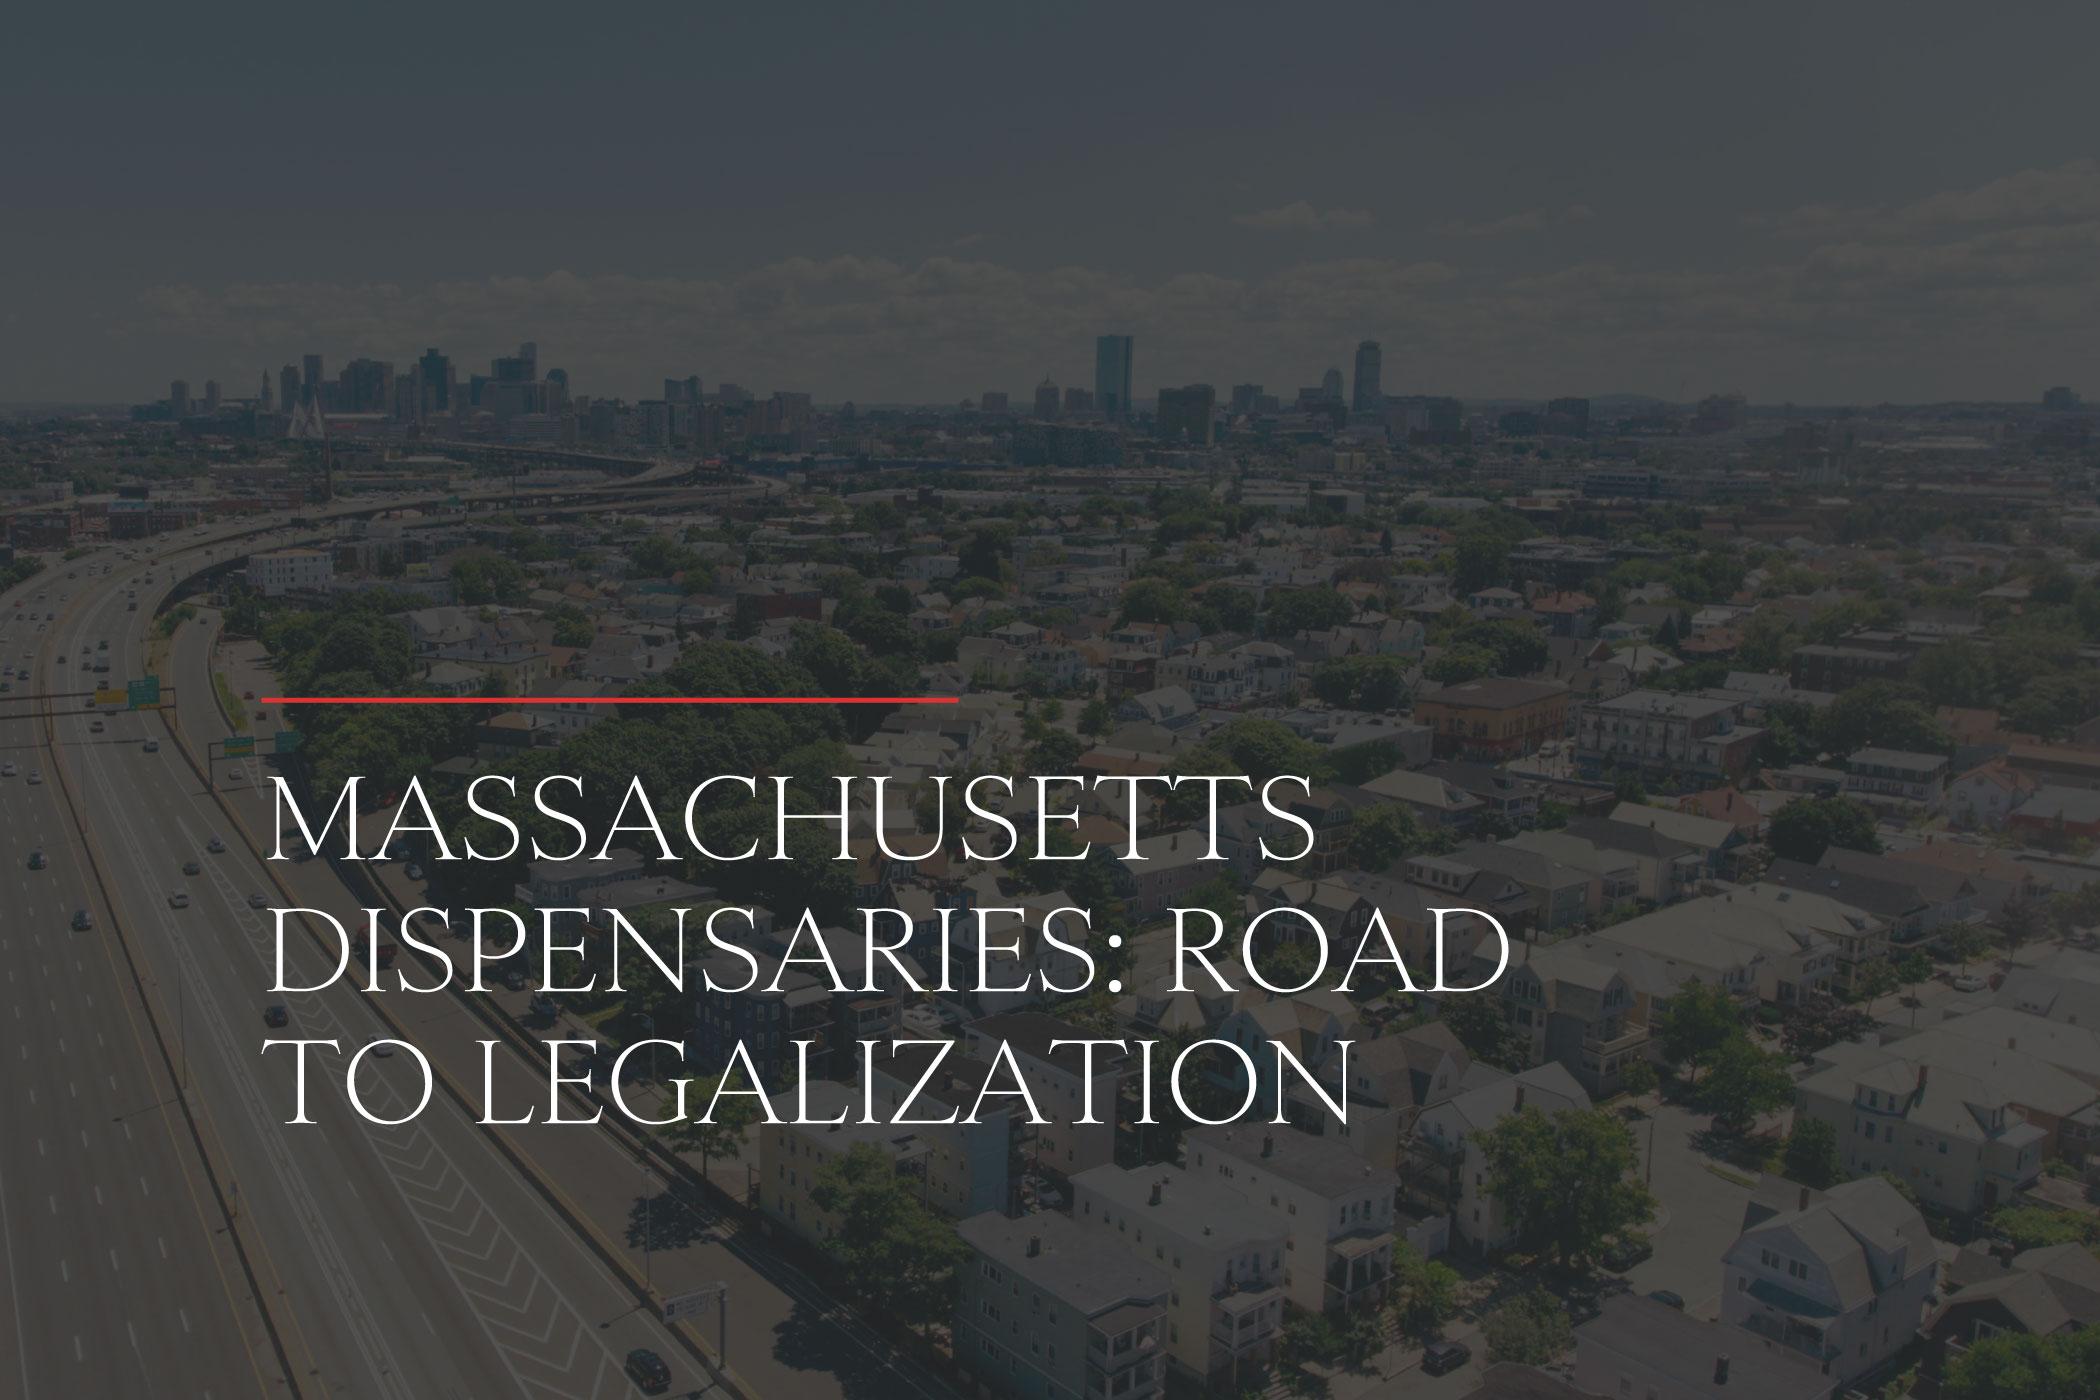 Massachusetts Dispensaries Road to Legalization